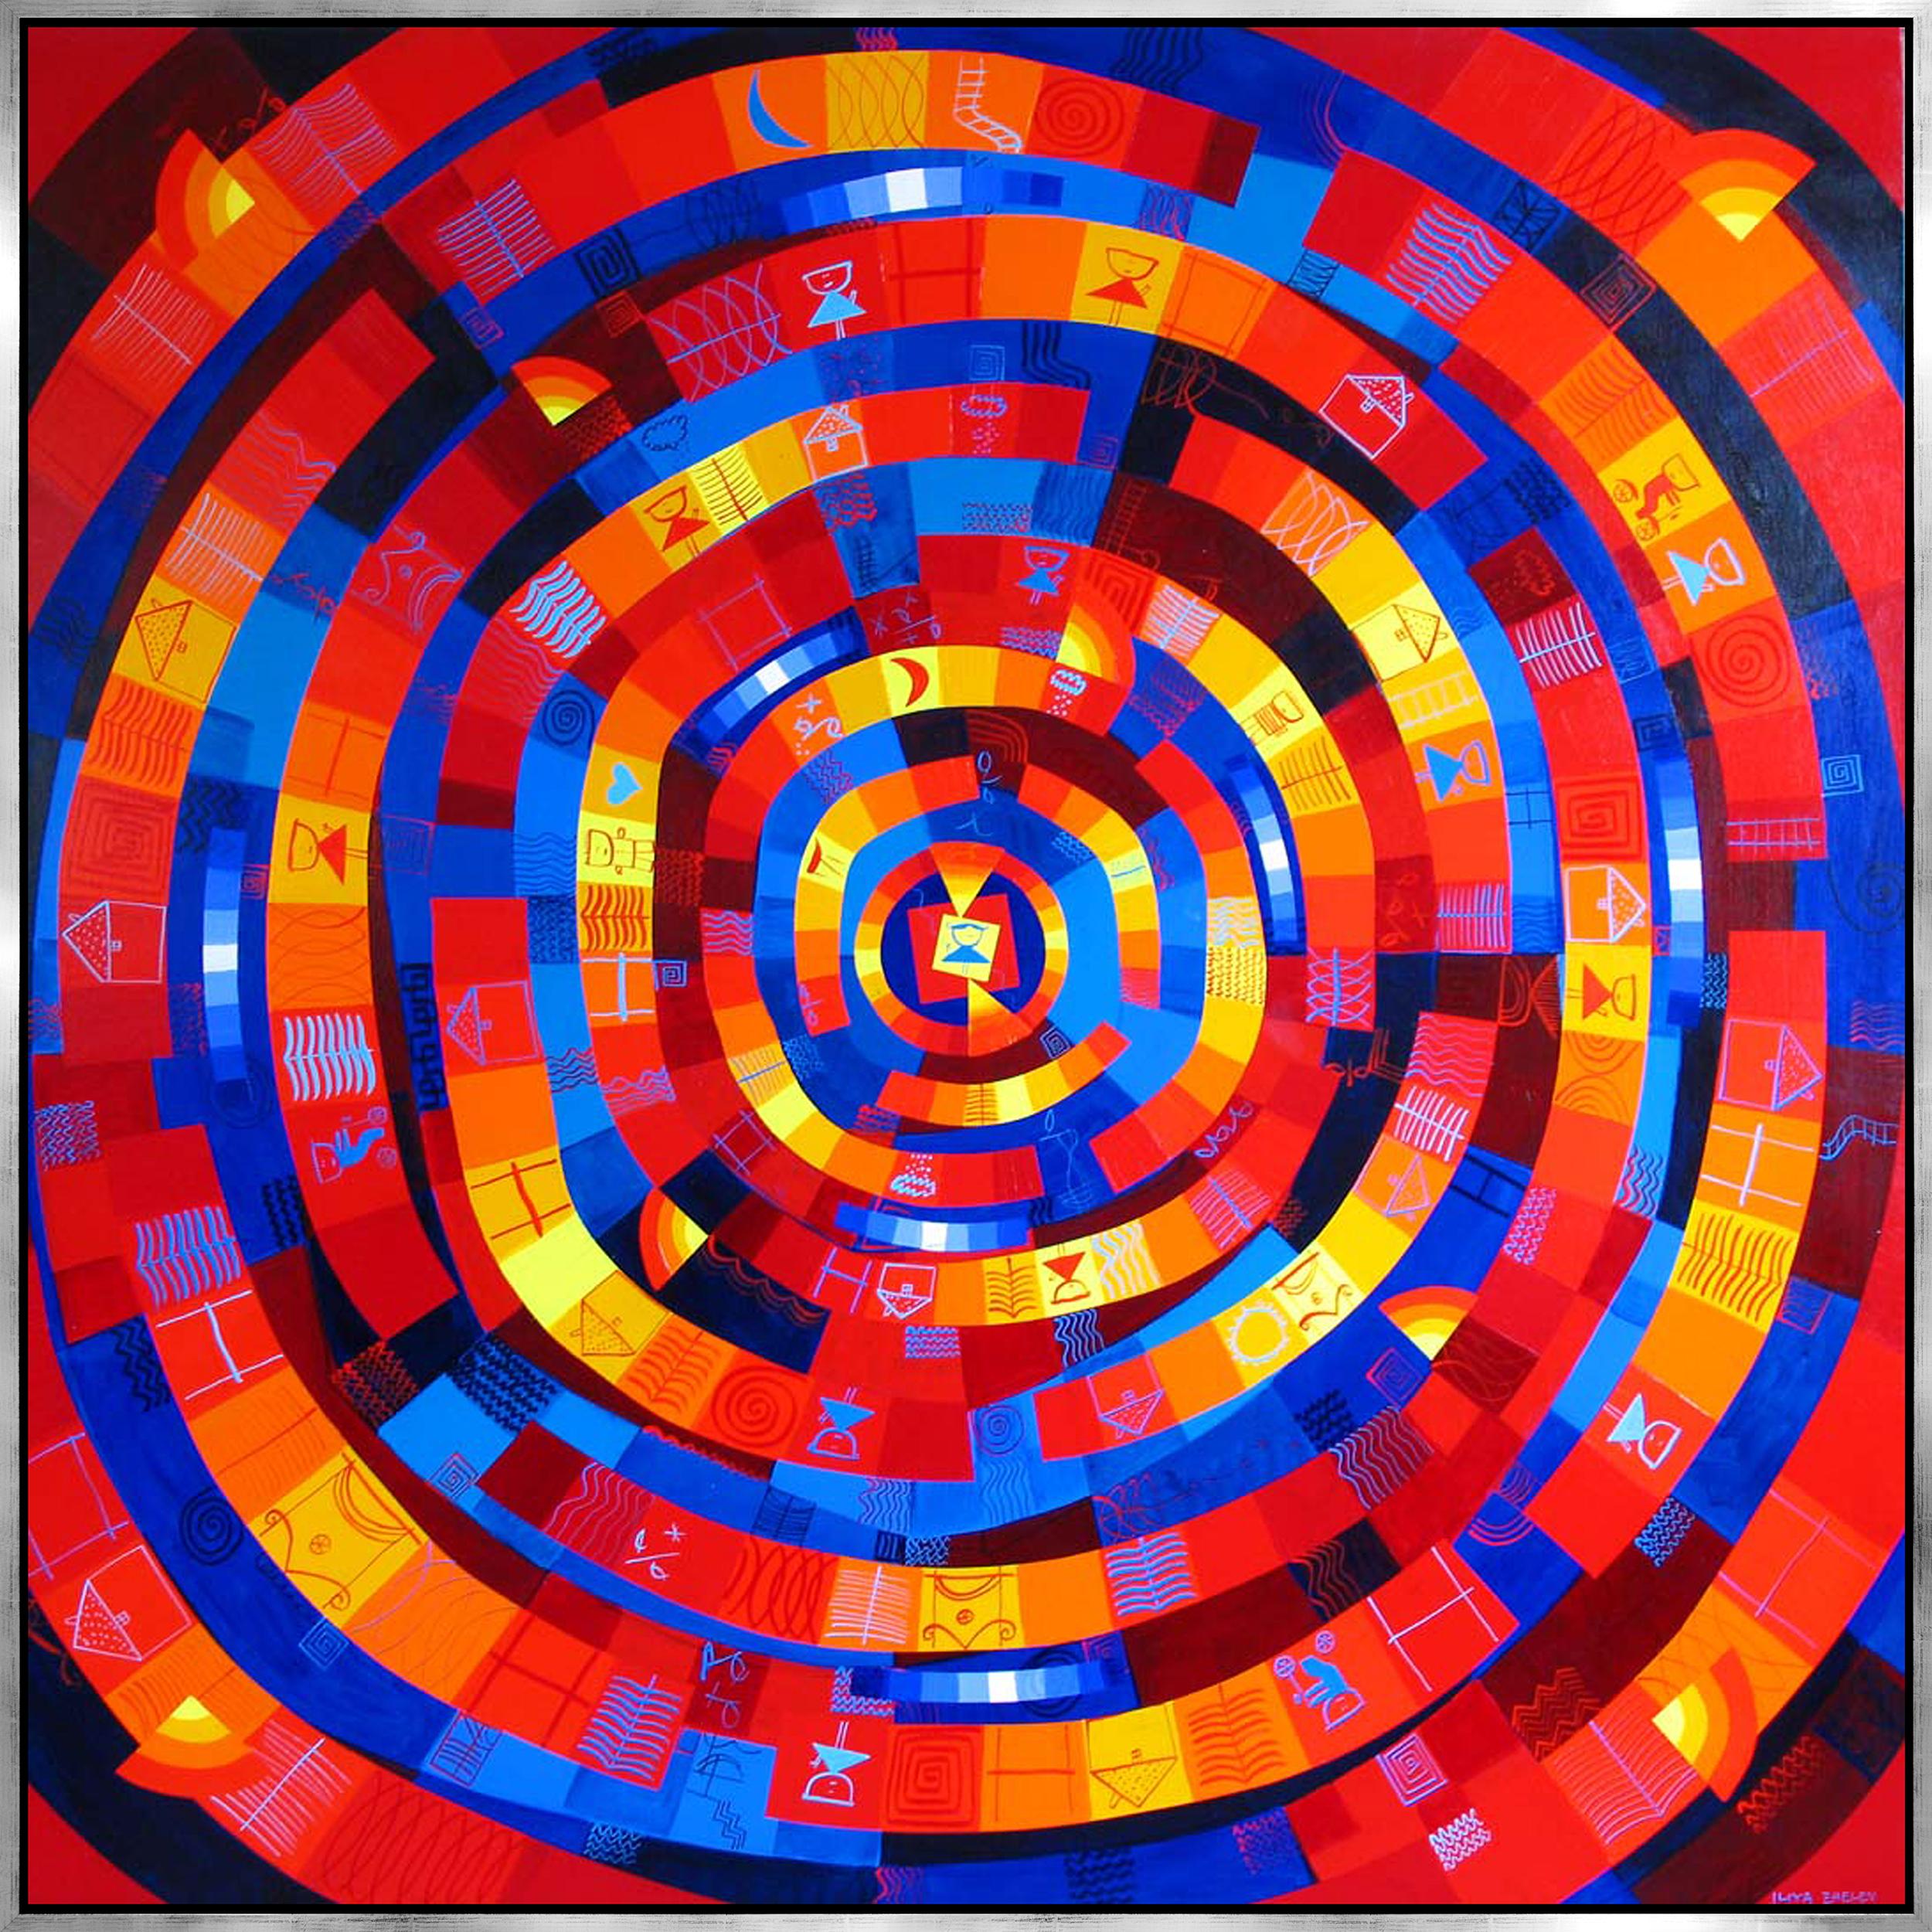 Iliya Zhelev - Story in a circle , 0509-012-709